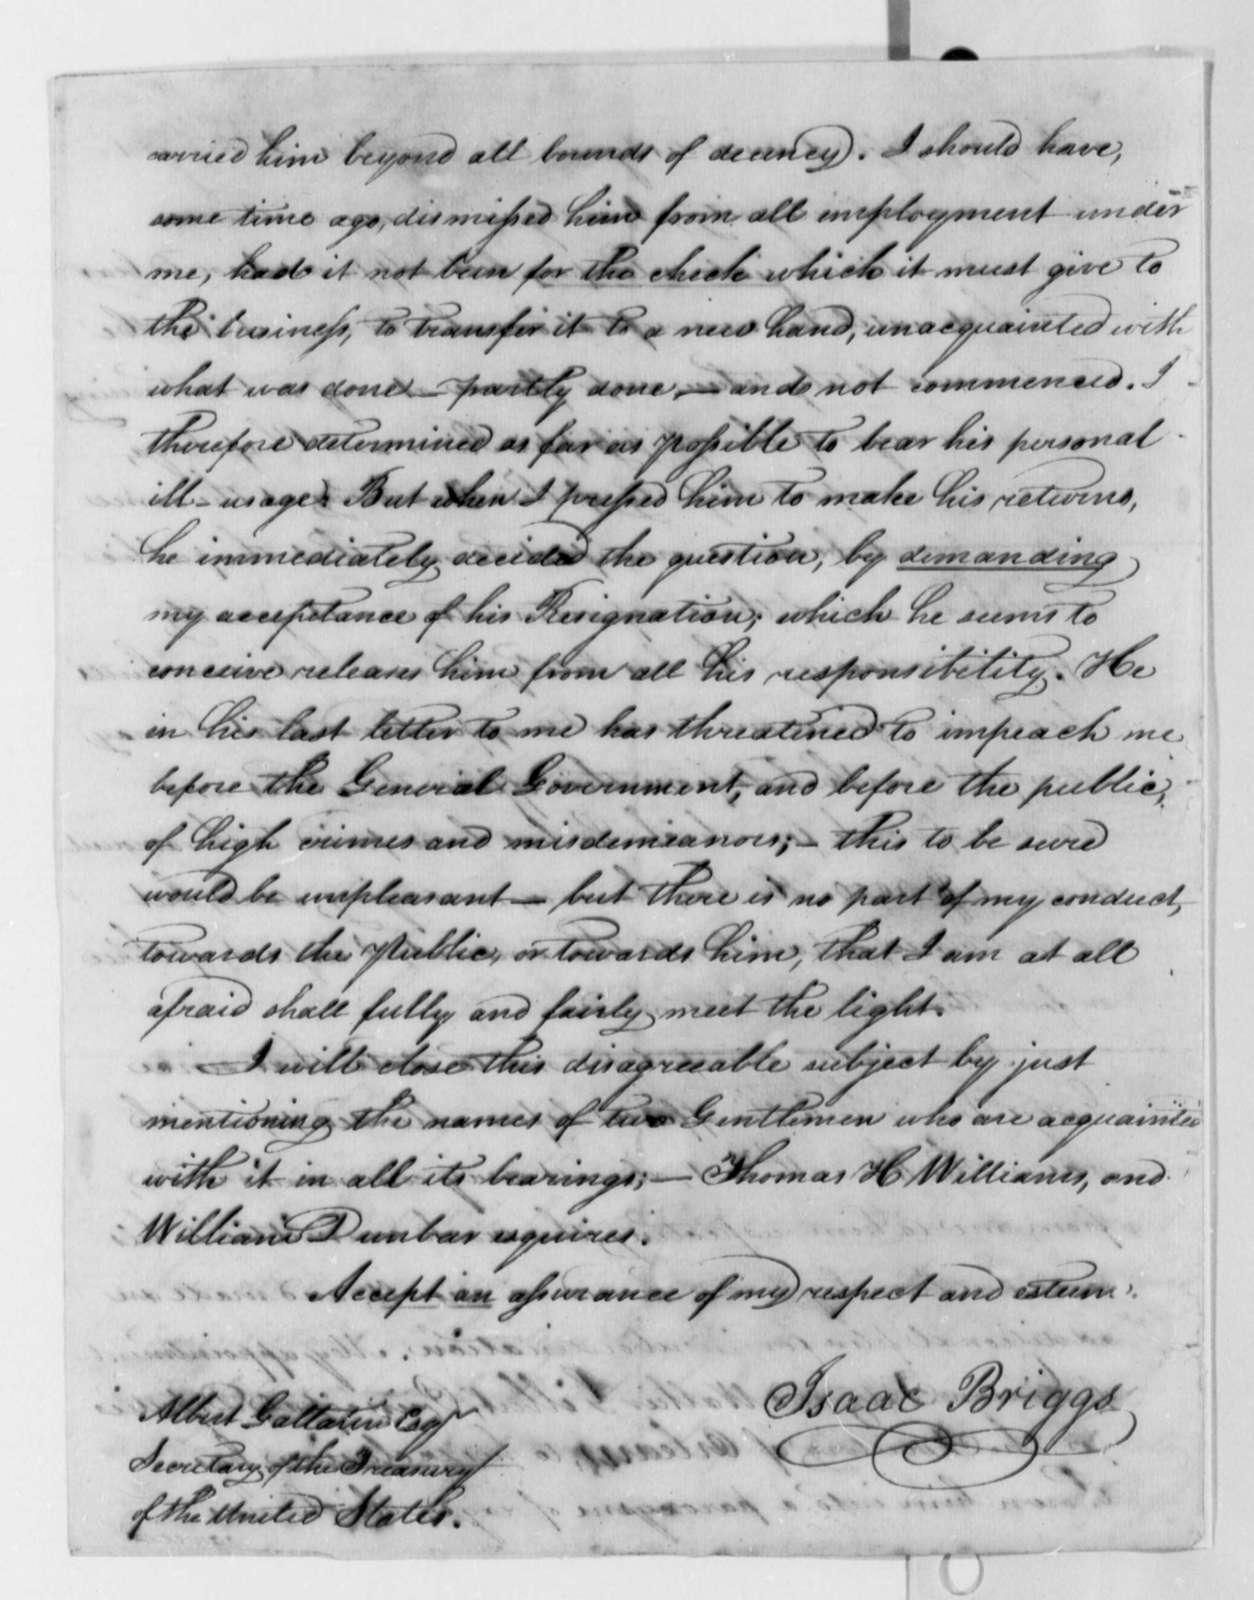 Isaac Briggs to Albert Gallatin, September 20, 1806